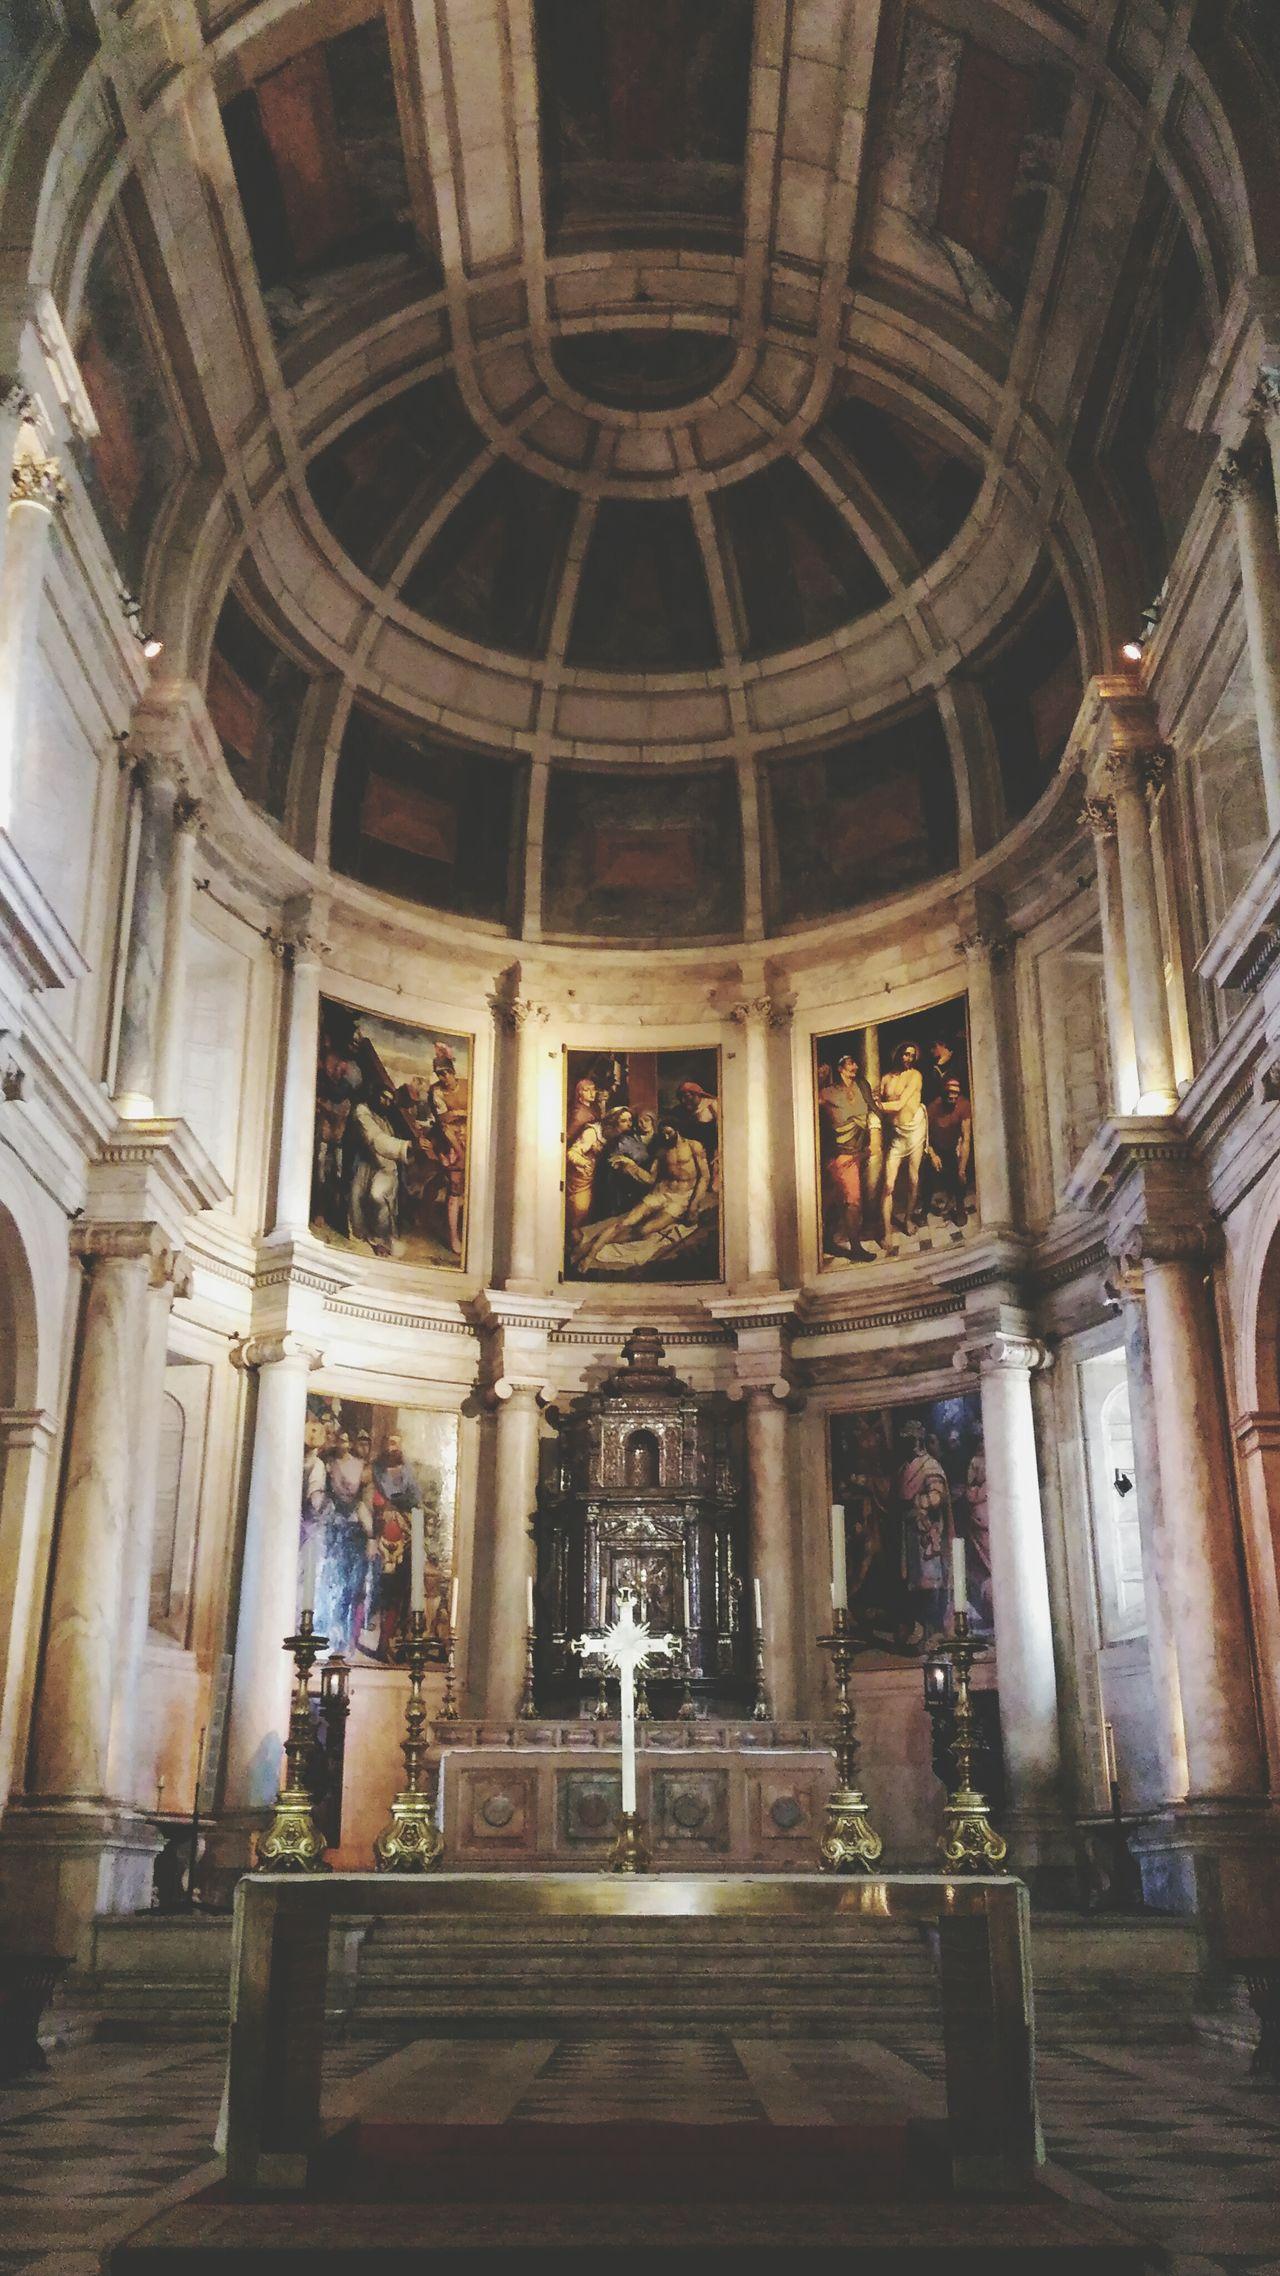 Religion Indoors  Place Of Worship Architecture Fresco Day Architecture Old Monastery Mosteiro Dos Jerónimos Lisbon Lisboa Portugal The Architect - 2017 EyeEm Awards